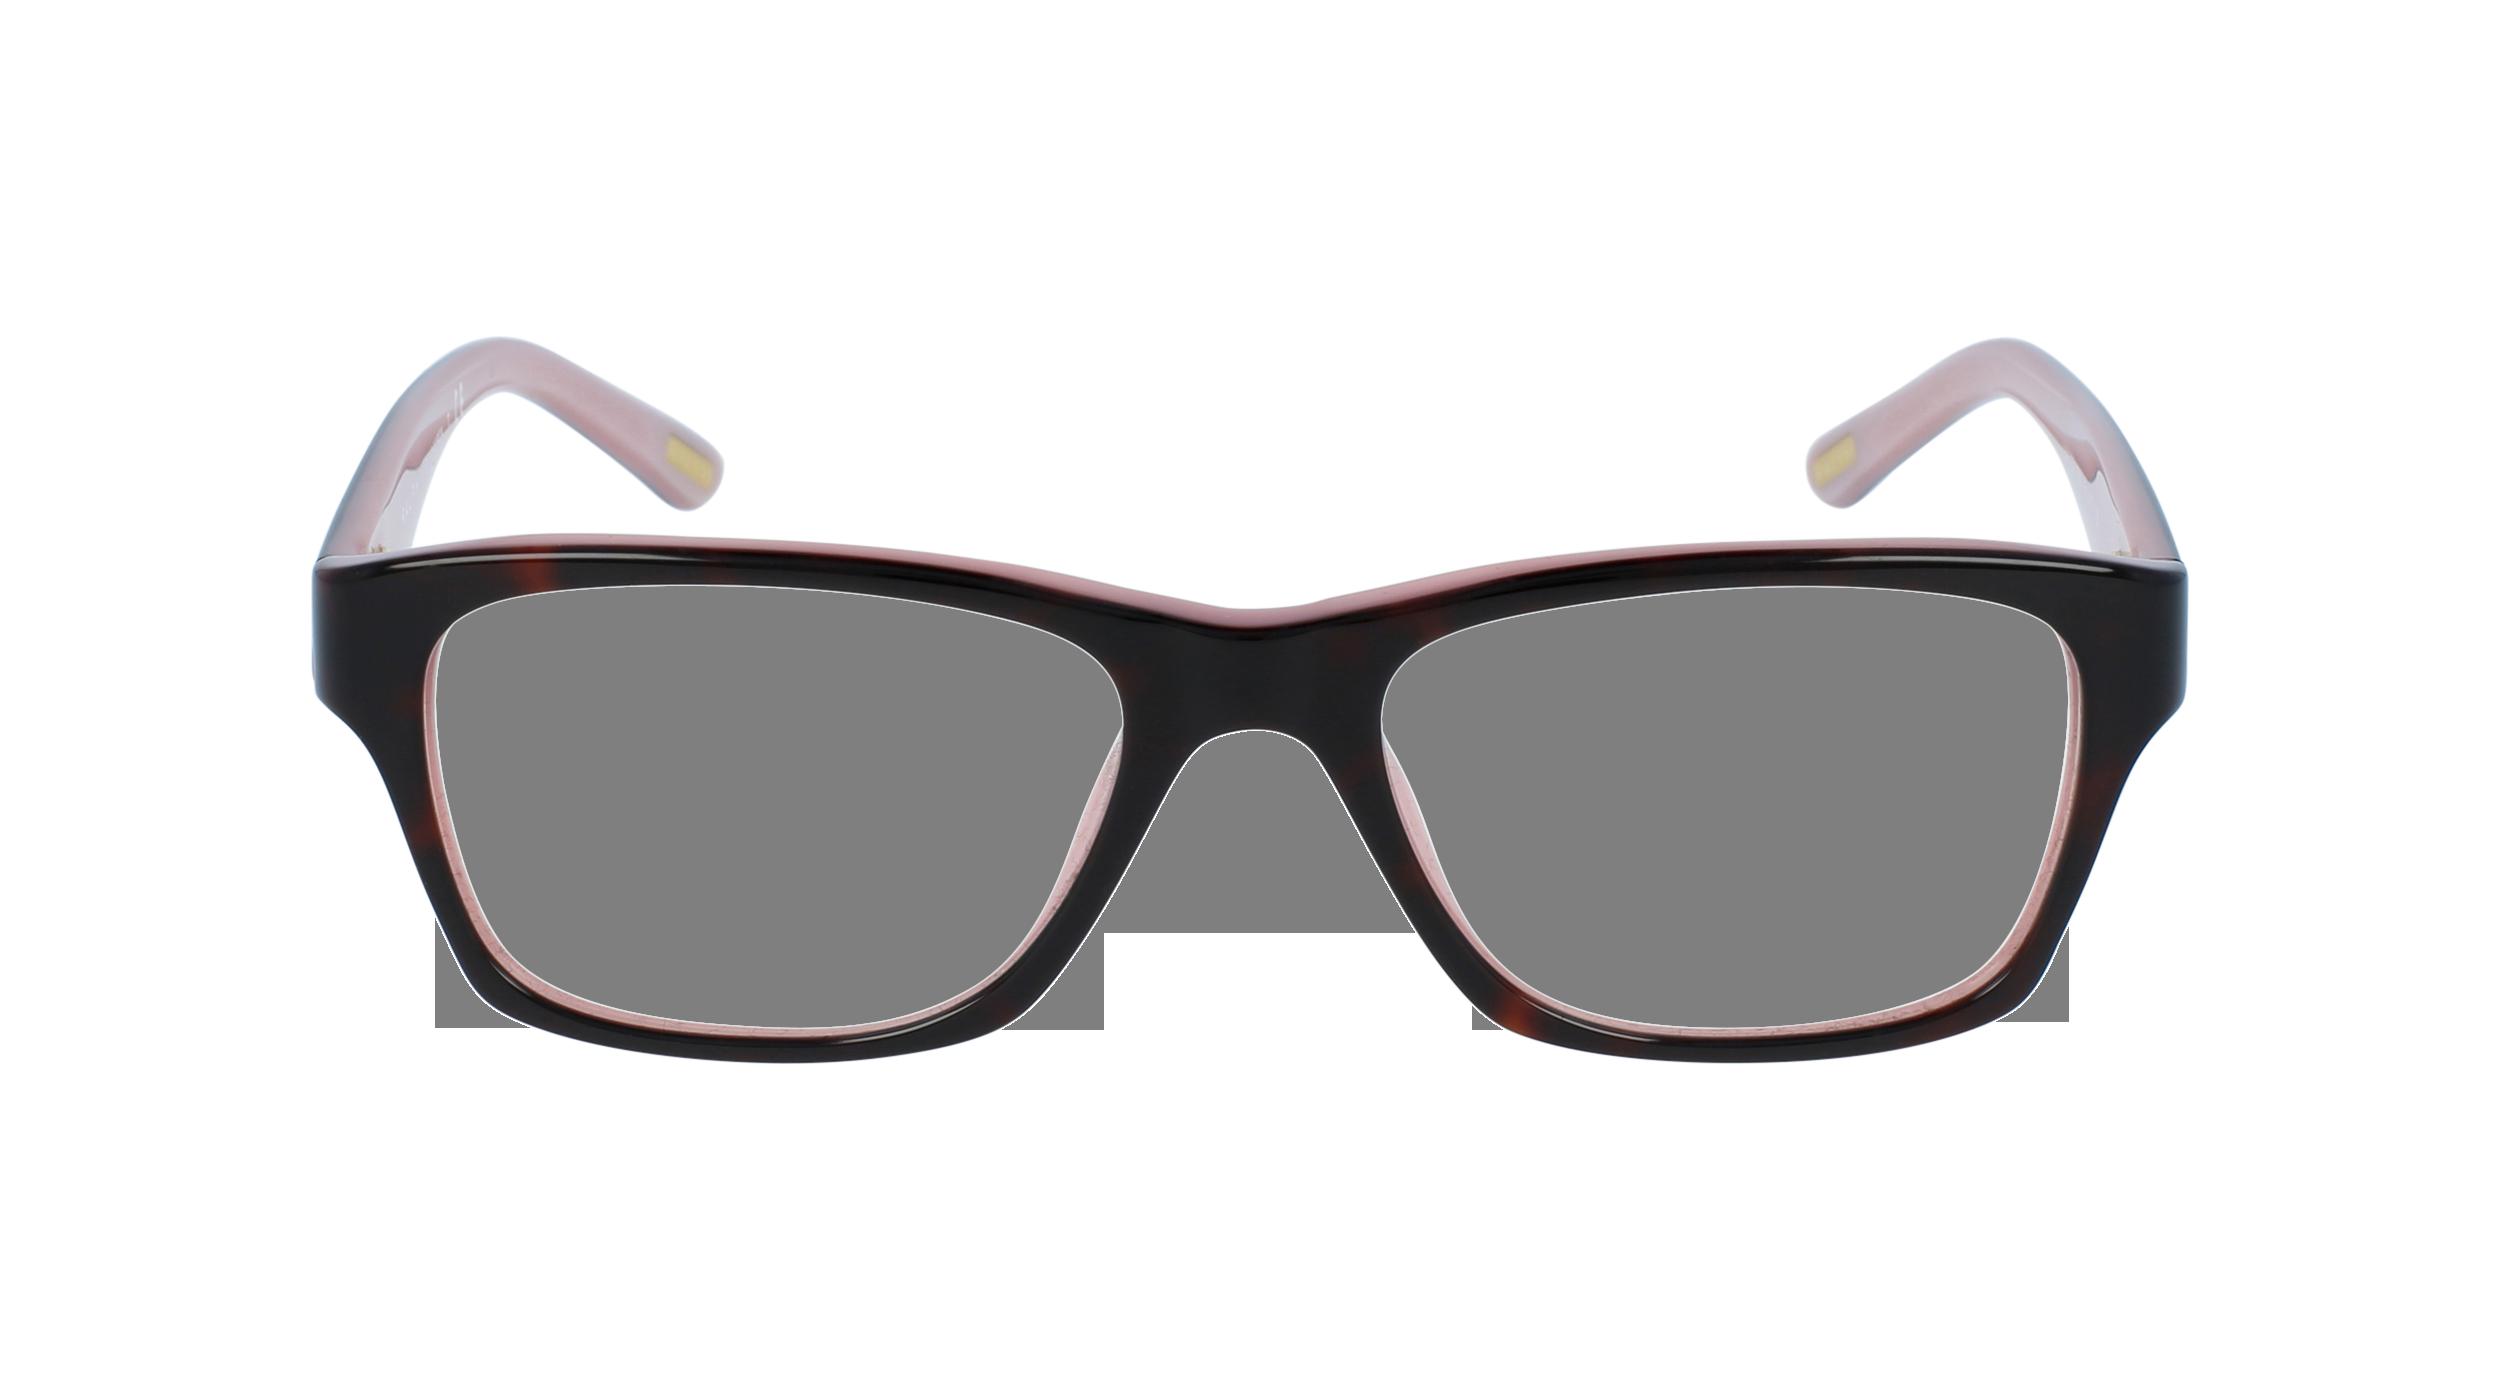 optic2000-lunettes-soleil-ralph